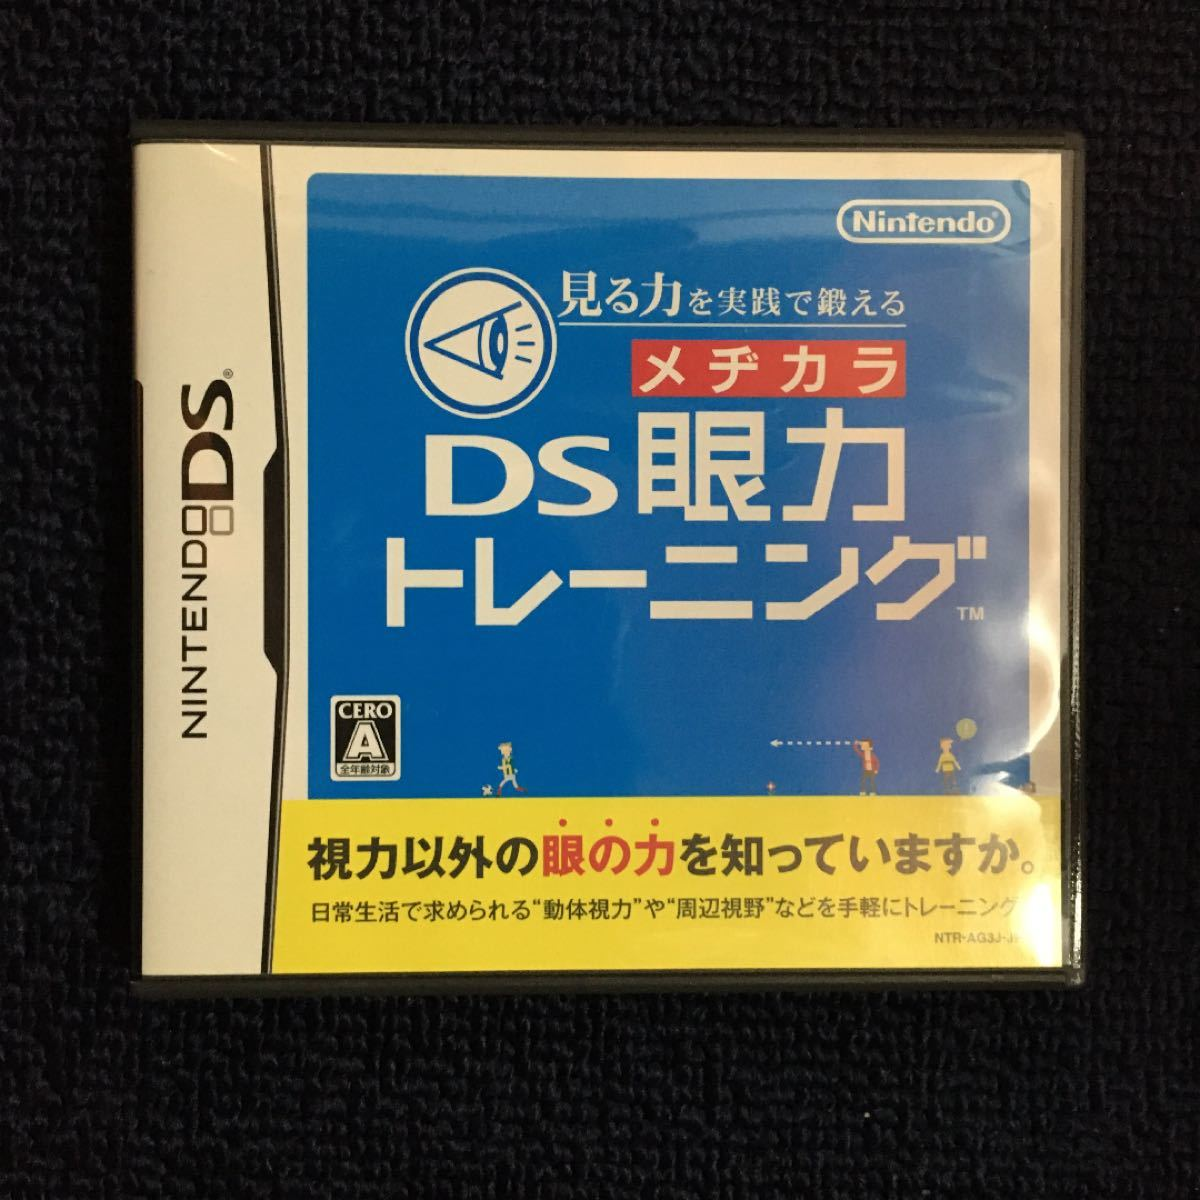 【DSソフト3本】 眼力トレーニング 常識力トレーニング 脳トレーニング